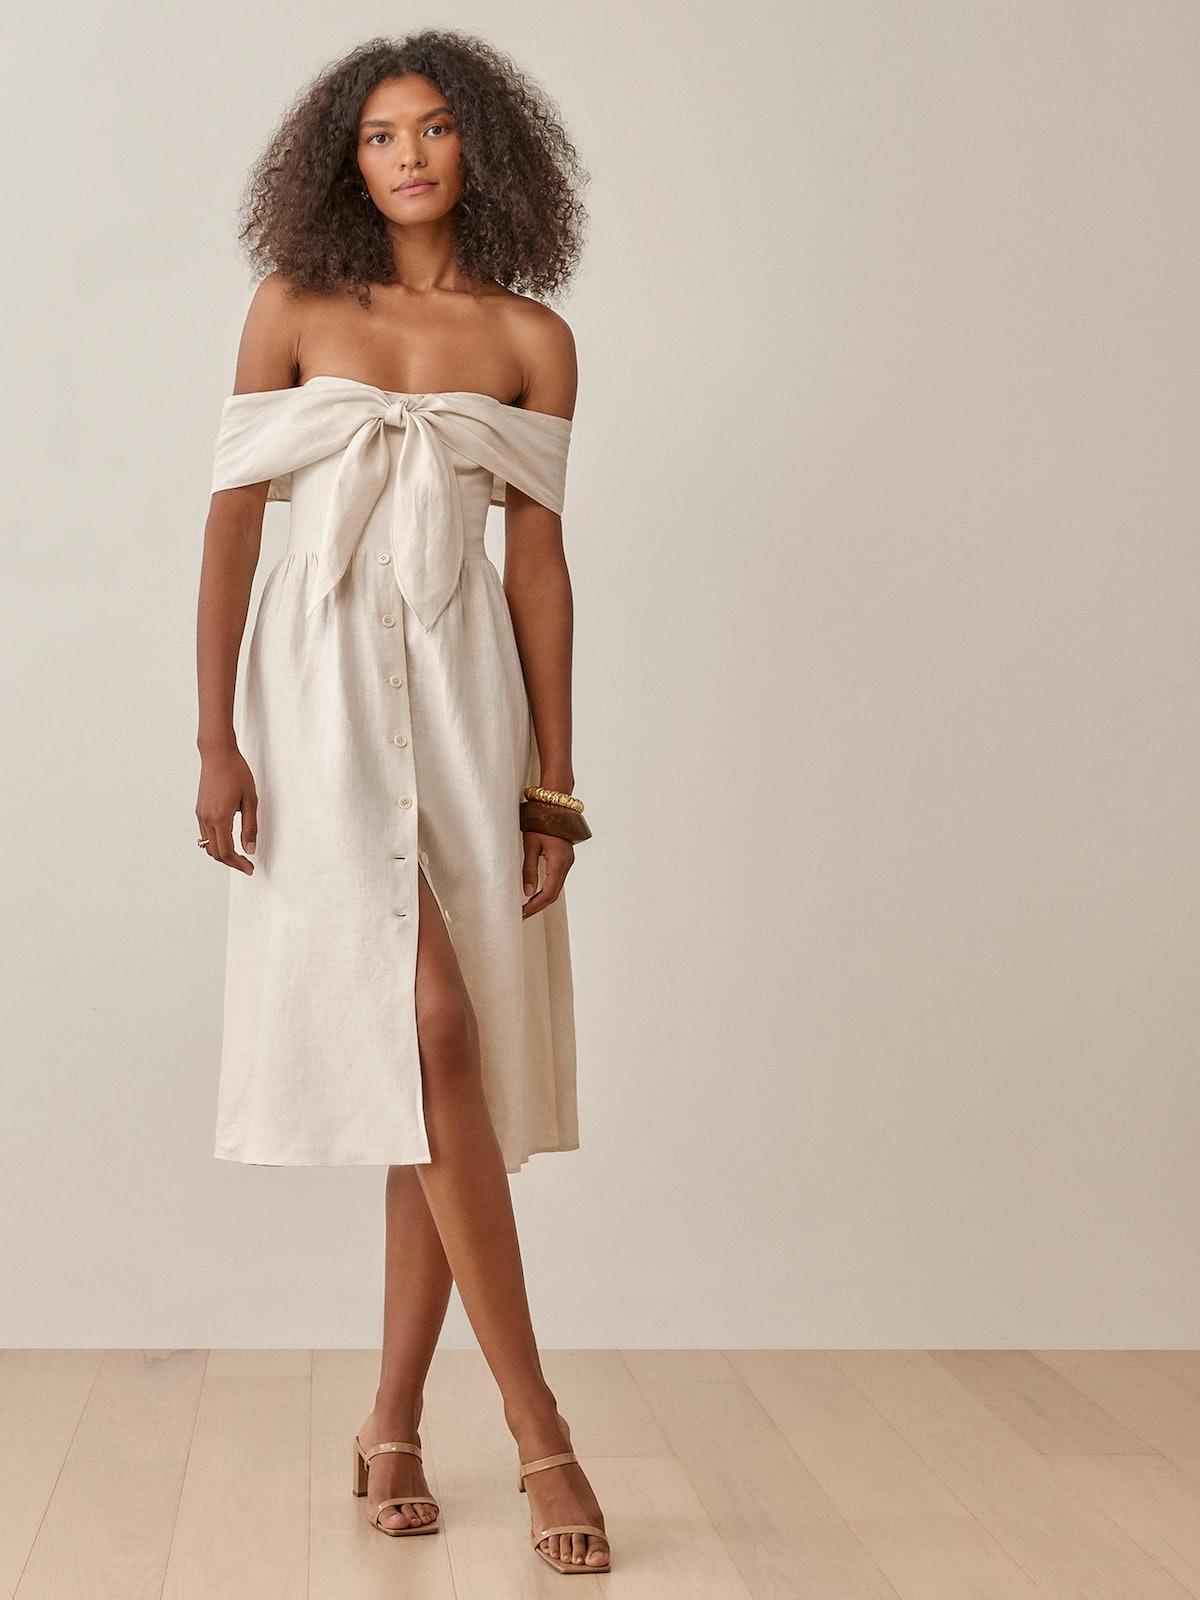 Barrington Linen Dress in Cream